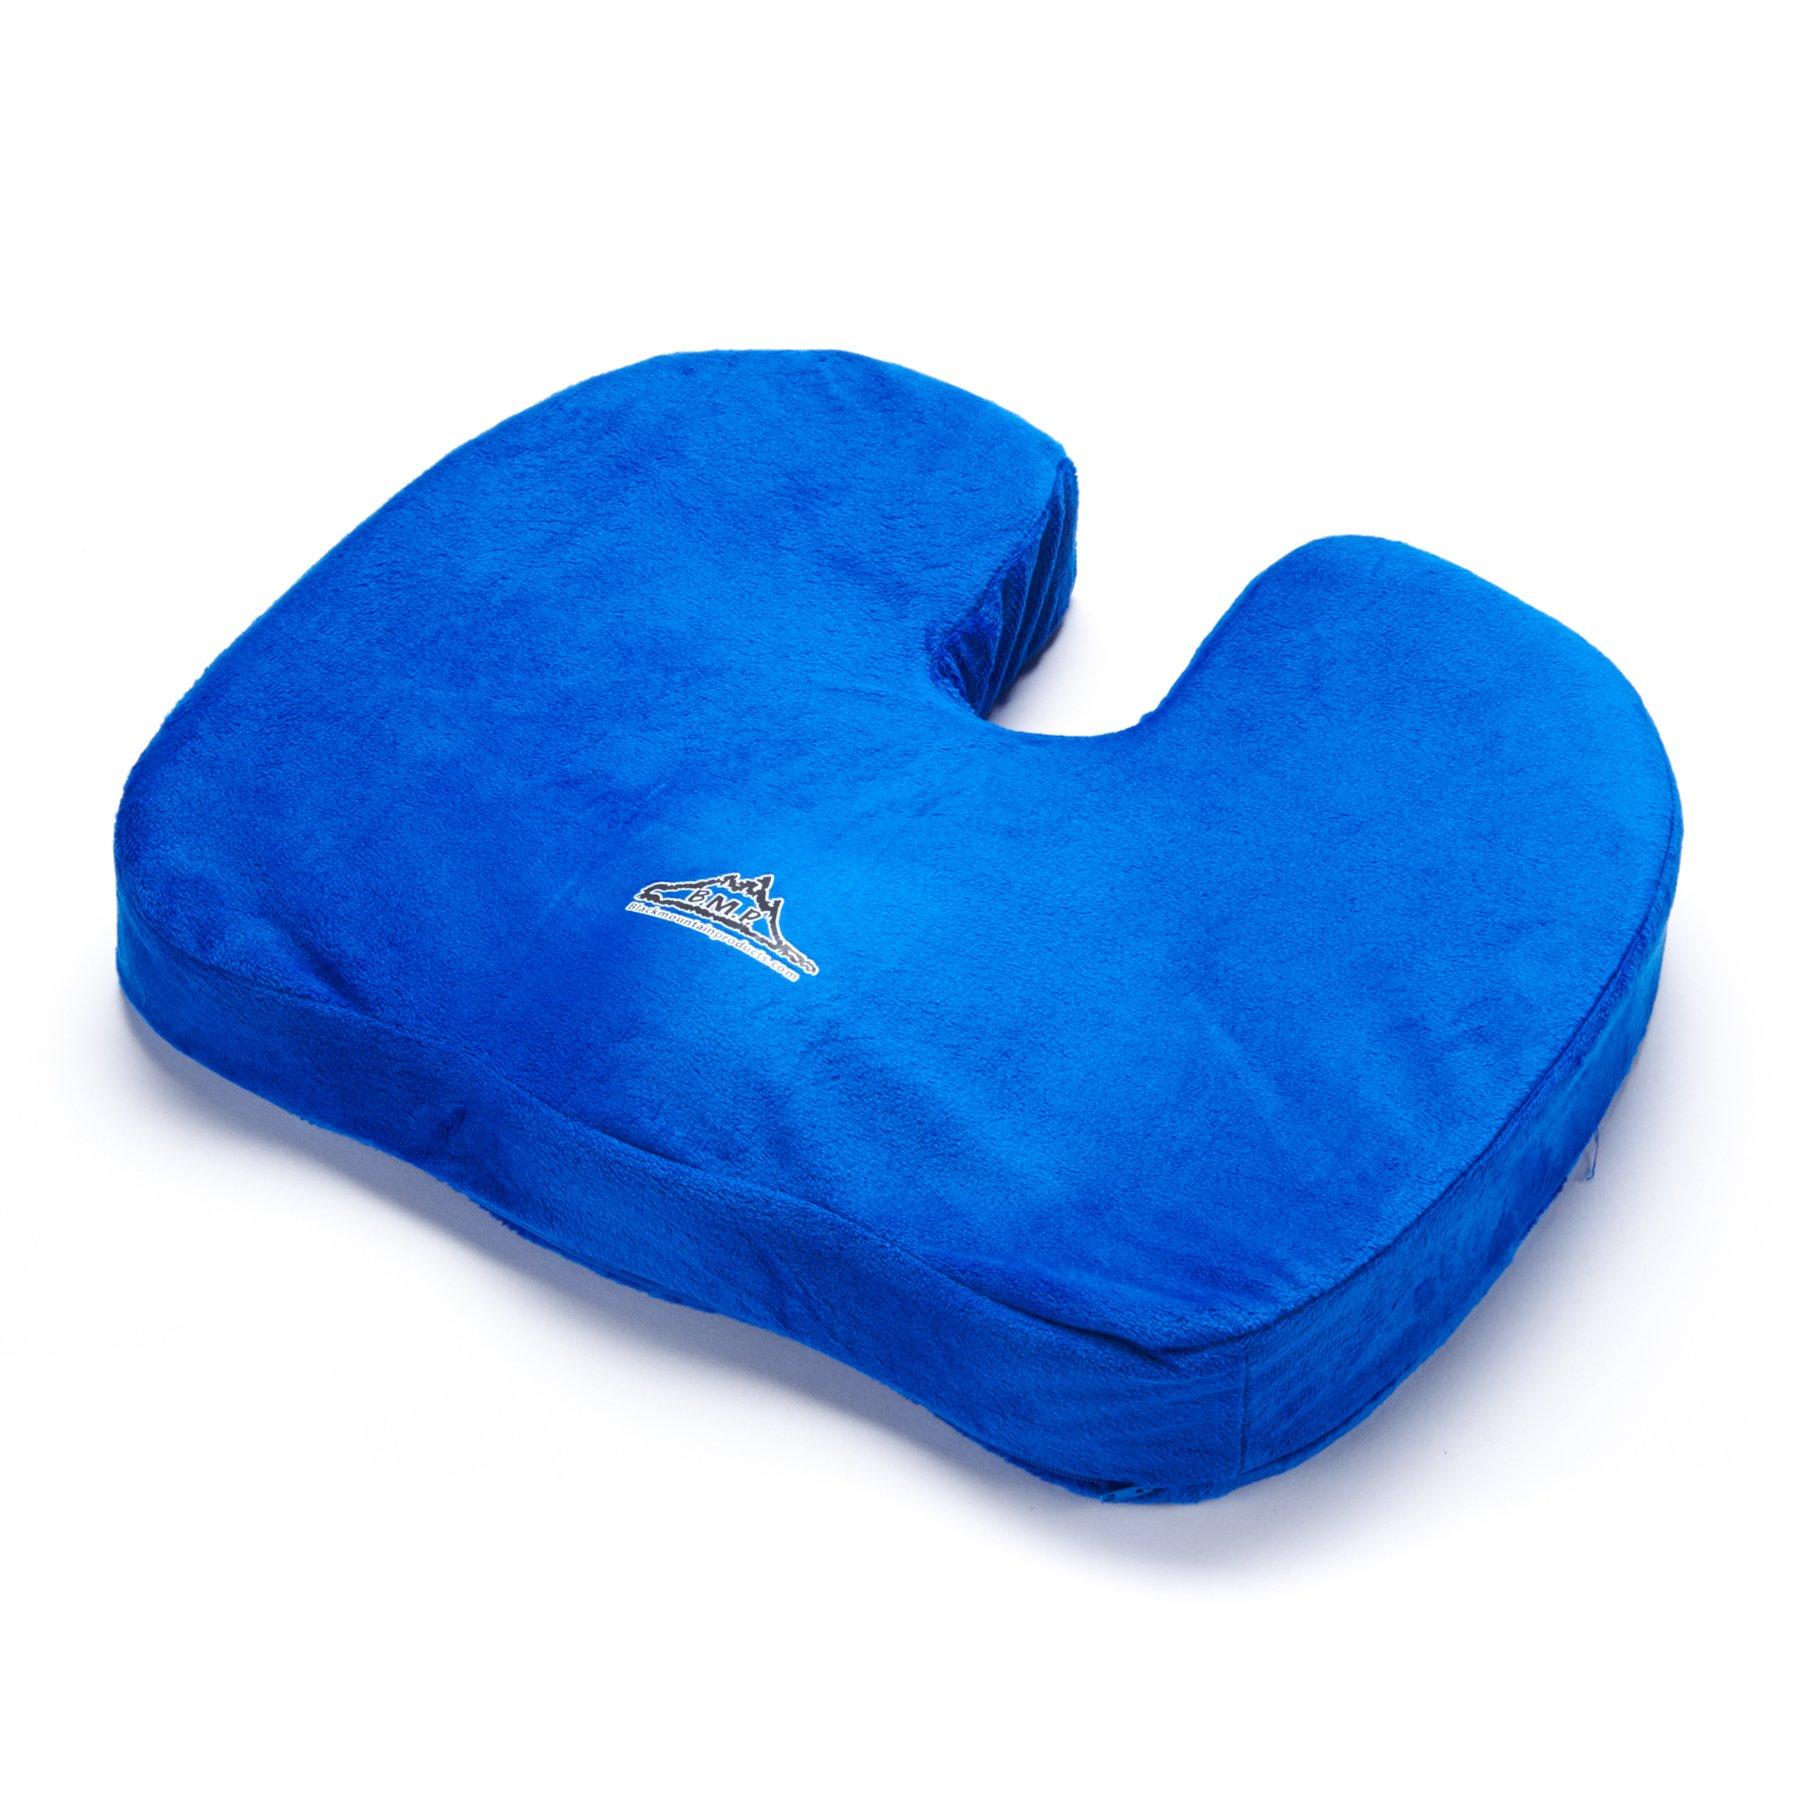 Black Mountain Products Orthopedic Comfort & Stadium Seat Cushion, Blue